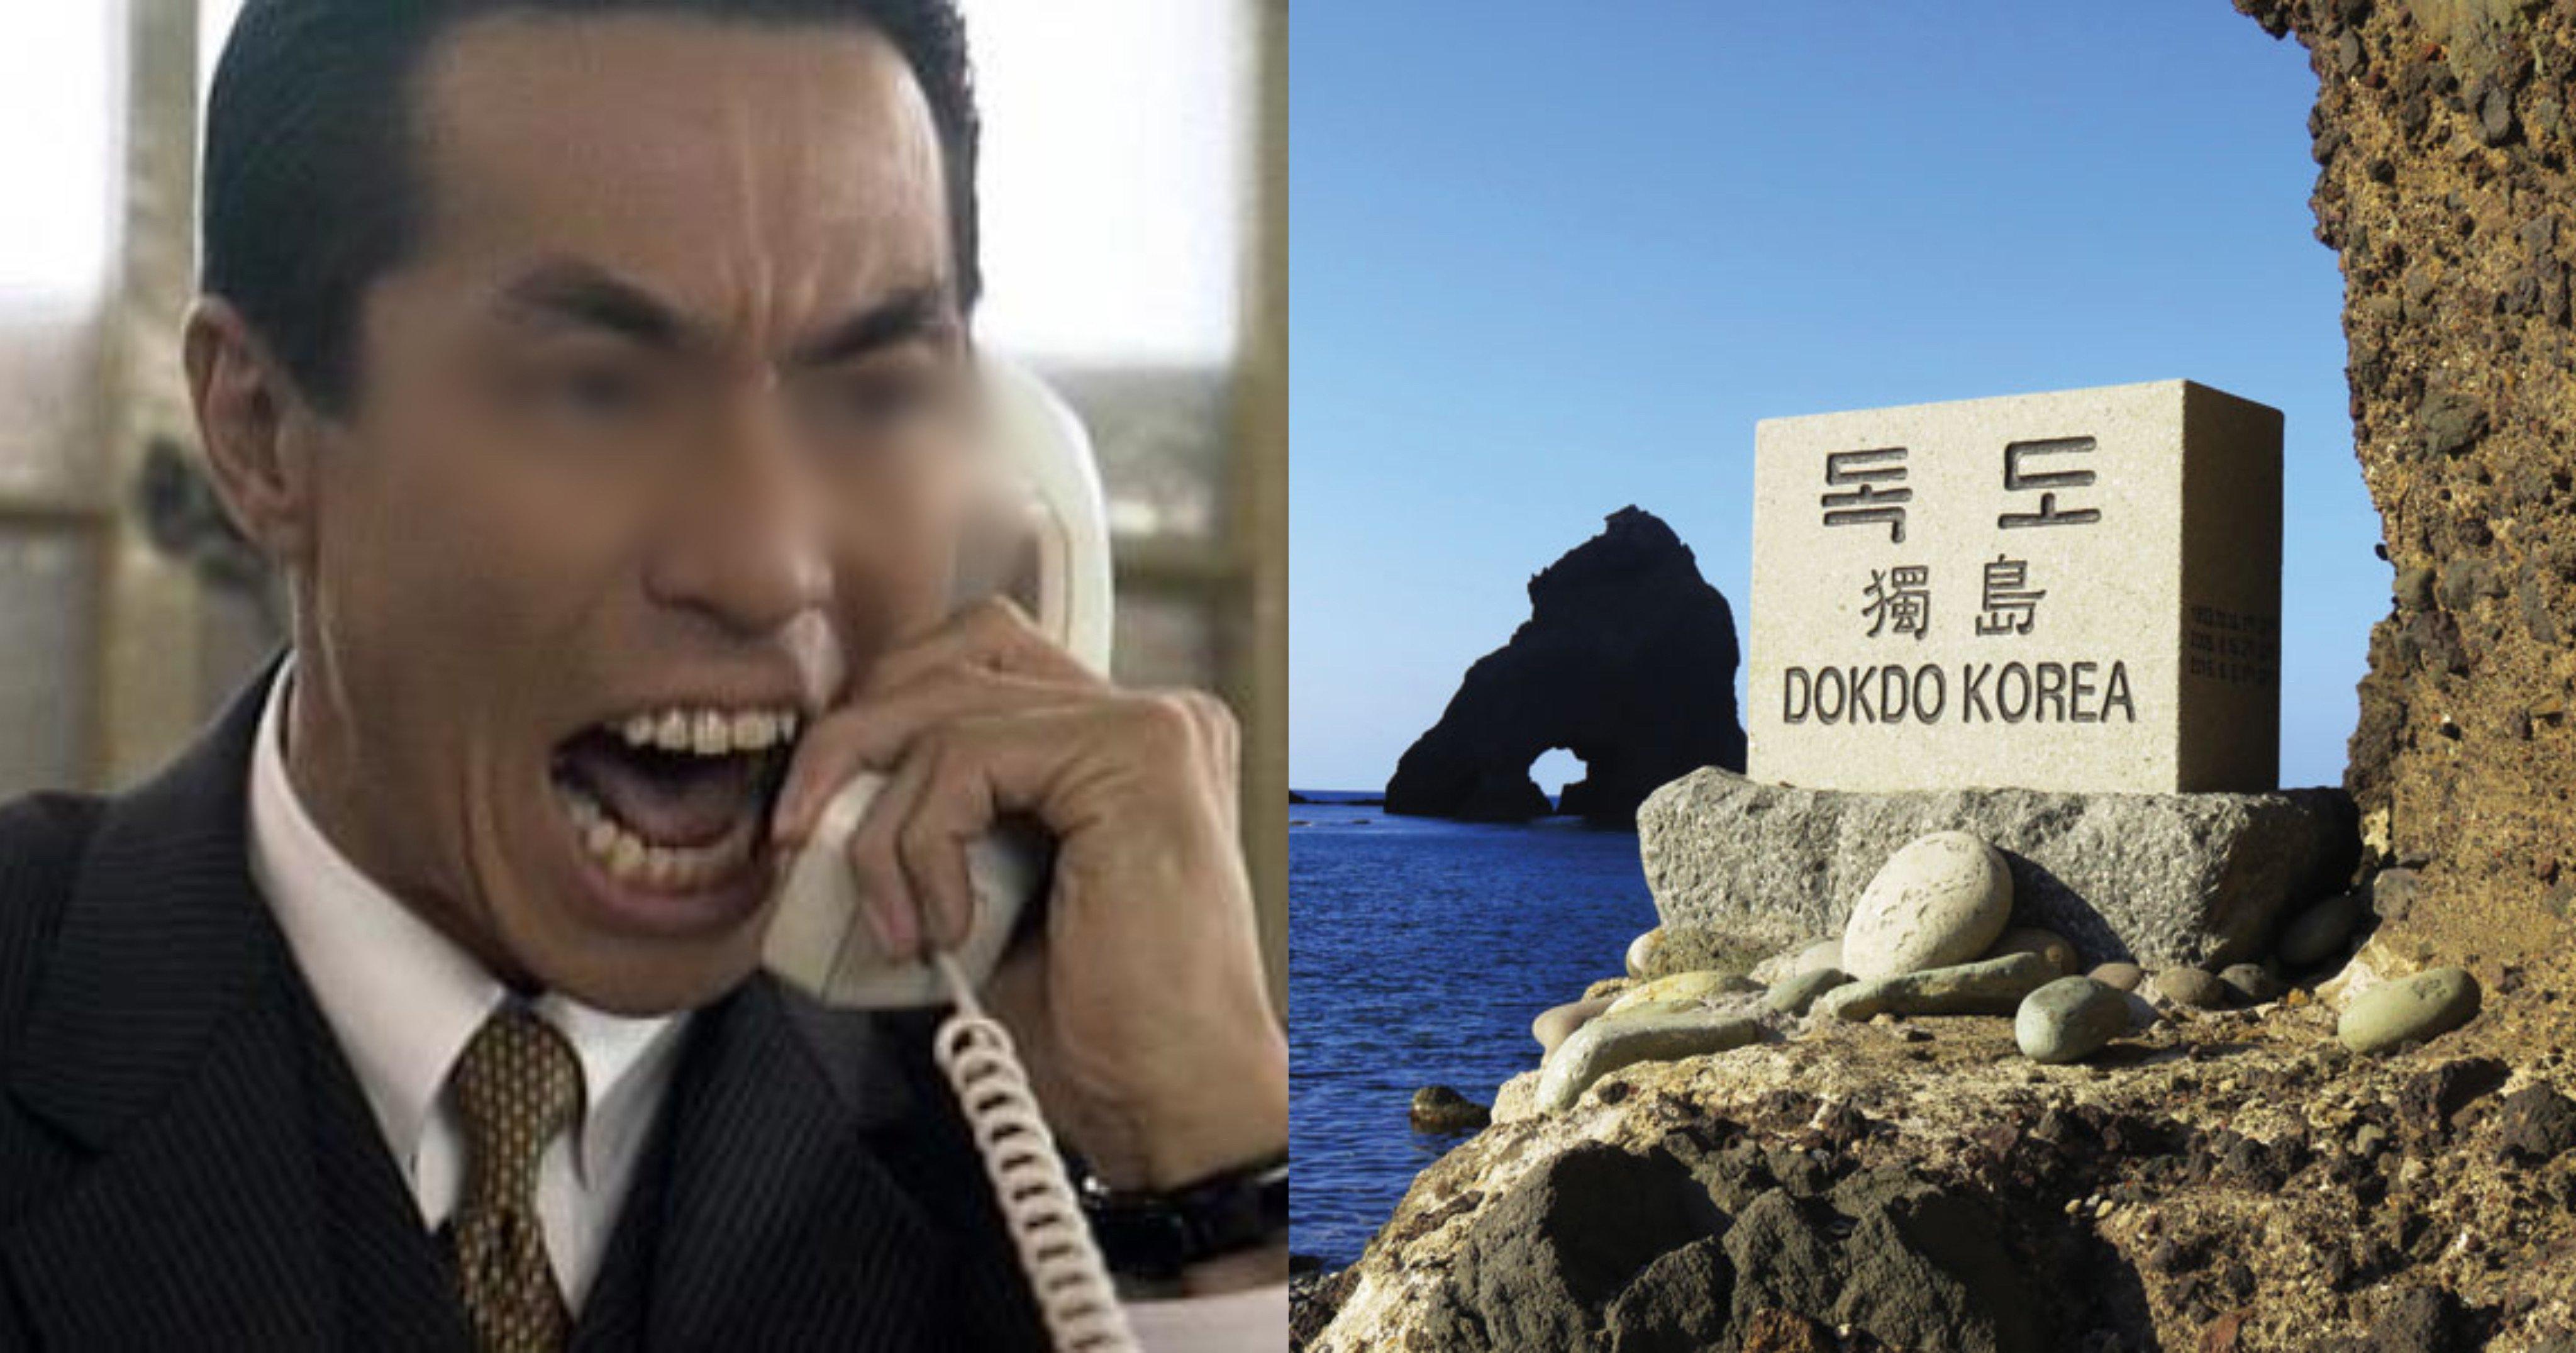 "kakaotalk 20210228 023403433.jpg?resize=412,232 - ""독도는 일본 고유 영토!!!""라며 생떼 부리는 일본 매체의 주장(+사진)"